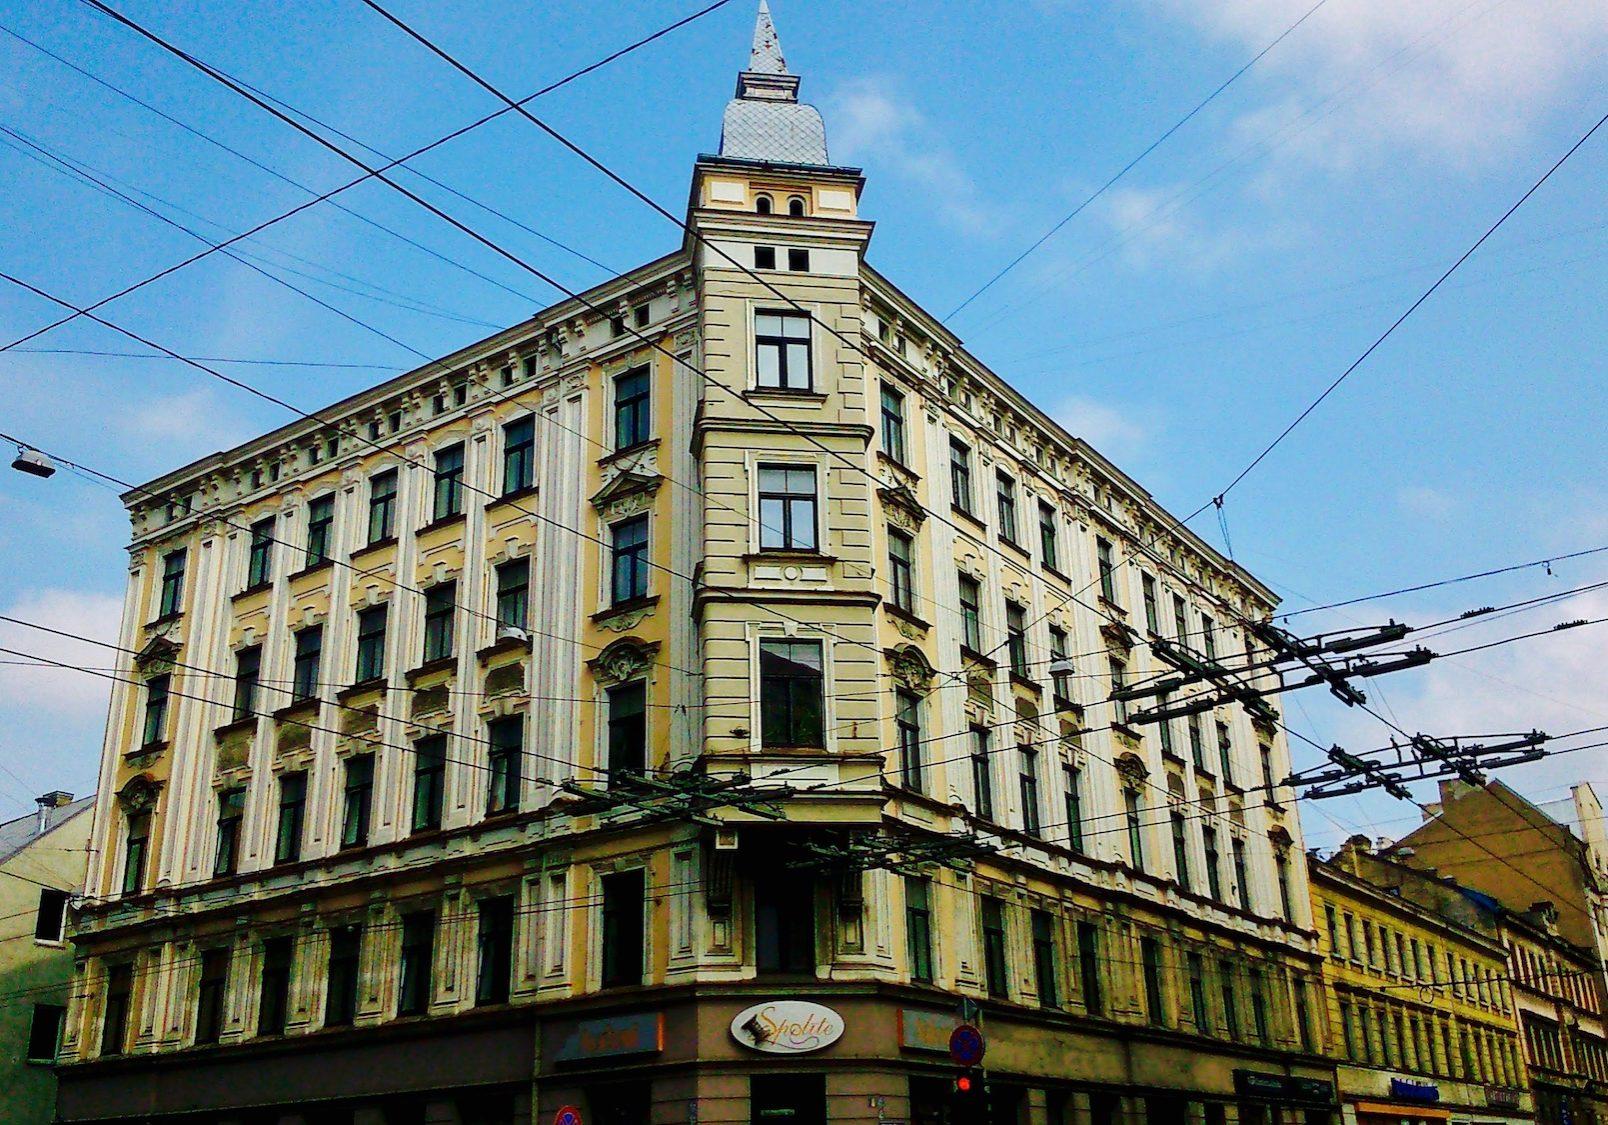 Beautiful architecture on Caka street